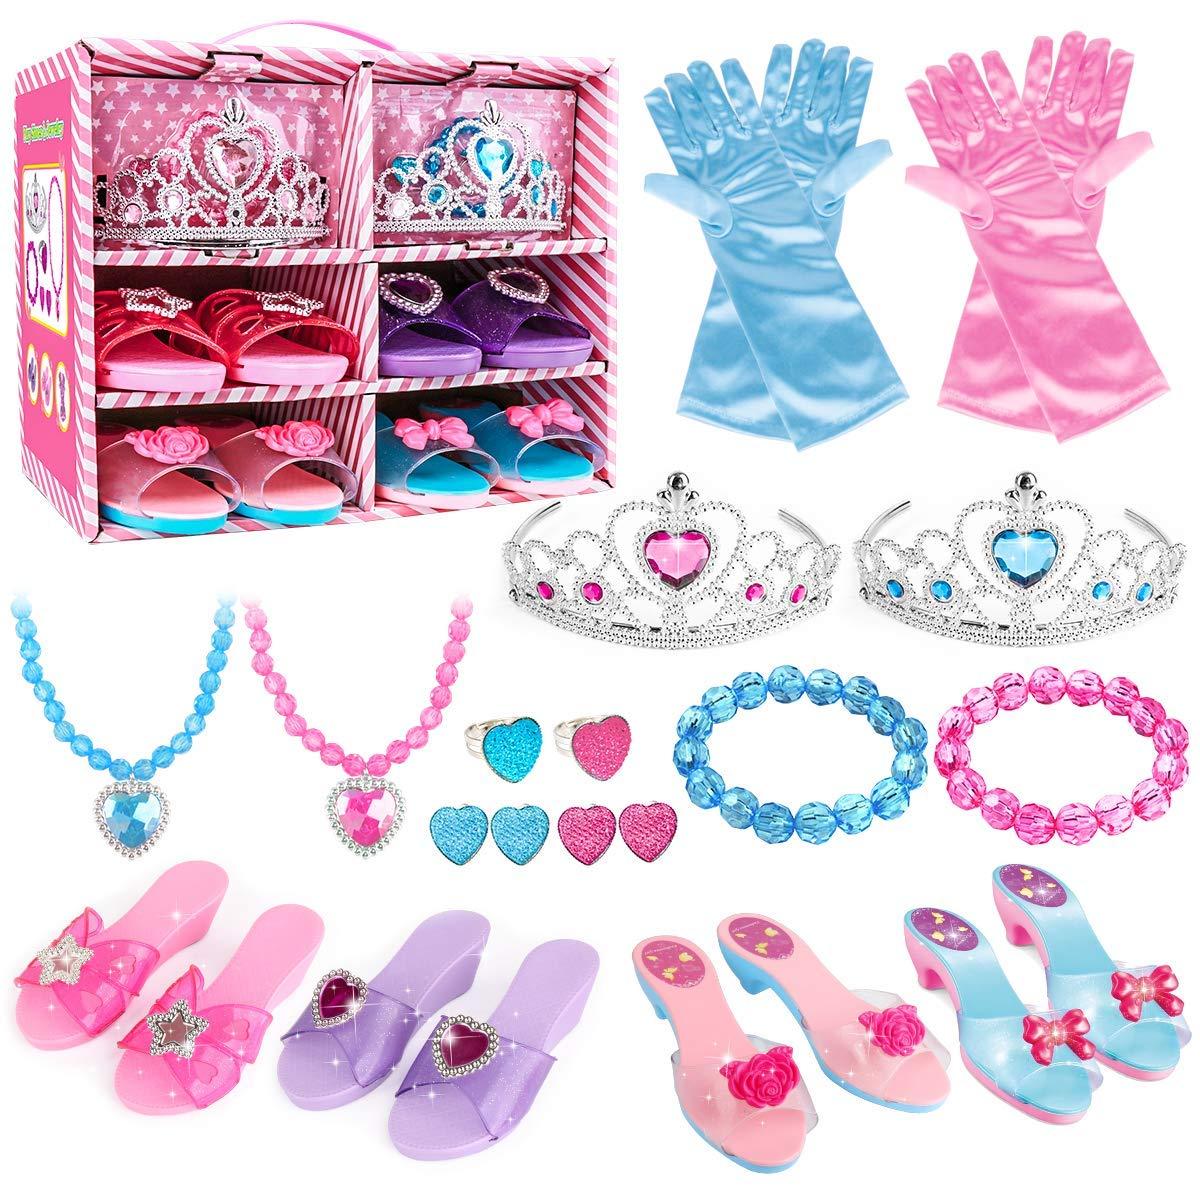 Meland Princess Dress Up Shoes and